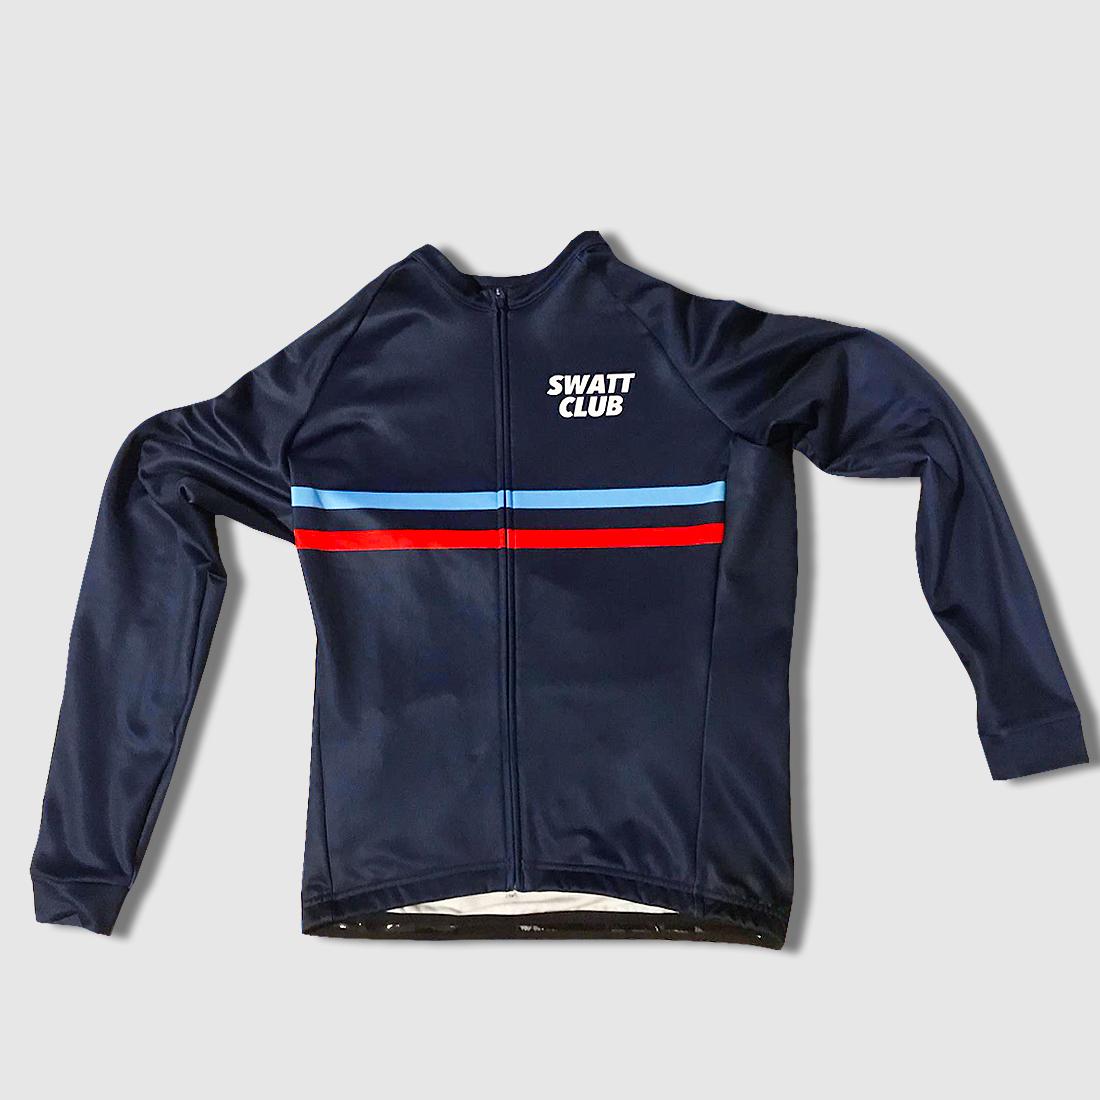 cycling Thermal Jersey Team swatt club swatt solowattaggip